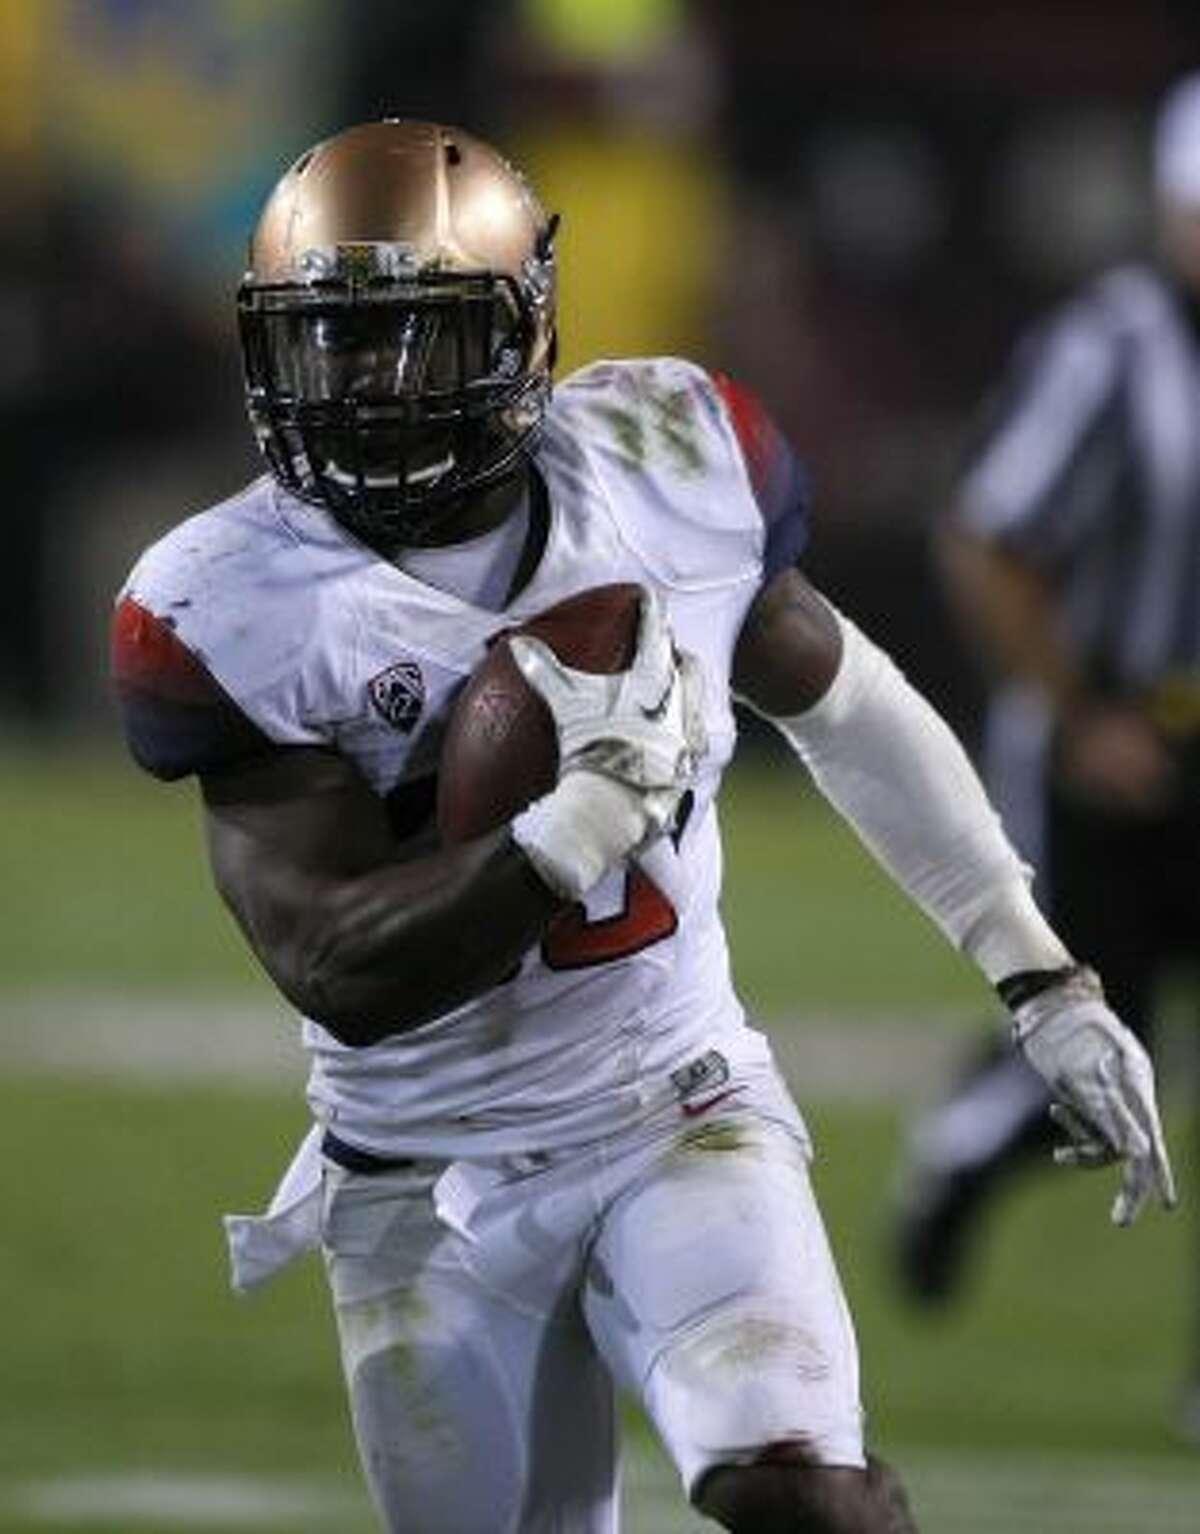 Arizona running back Ka'Deem Carey (25) rushed for 1,716 yards and 17 touchdowns this season.